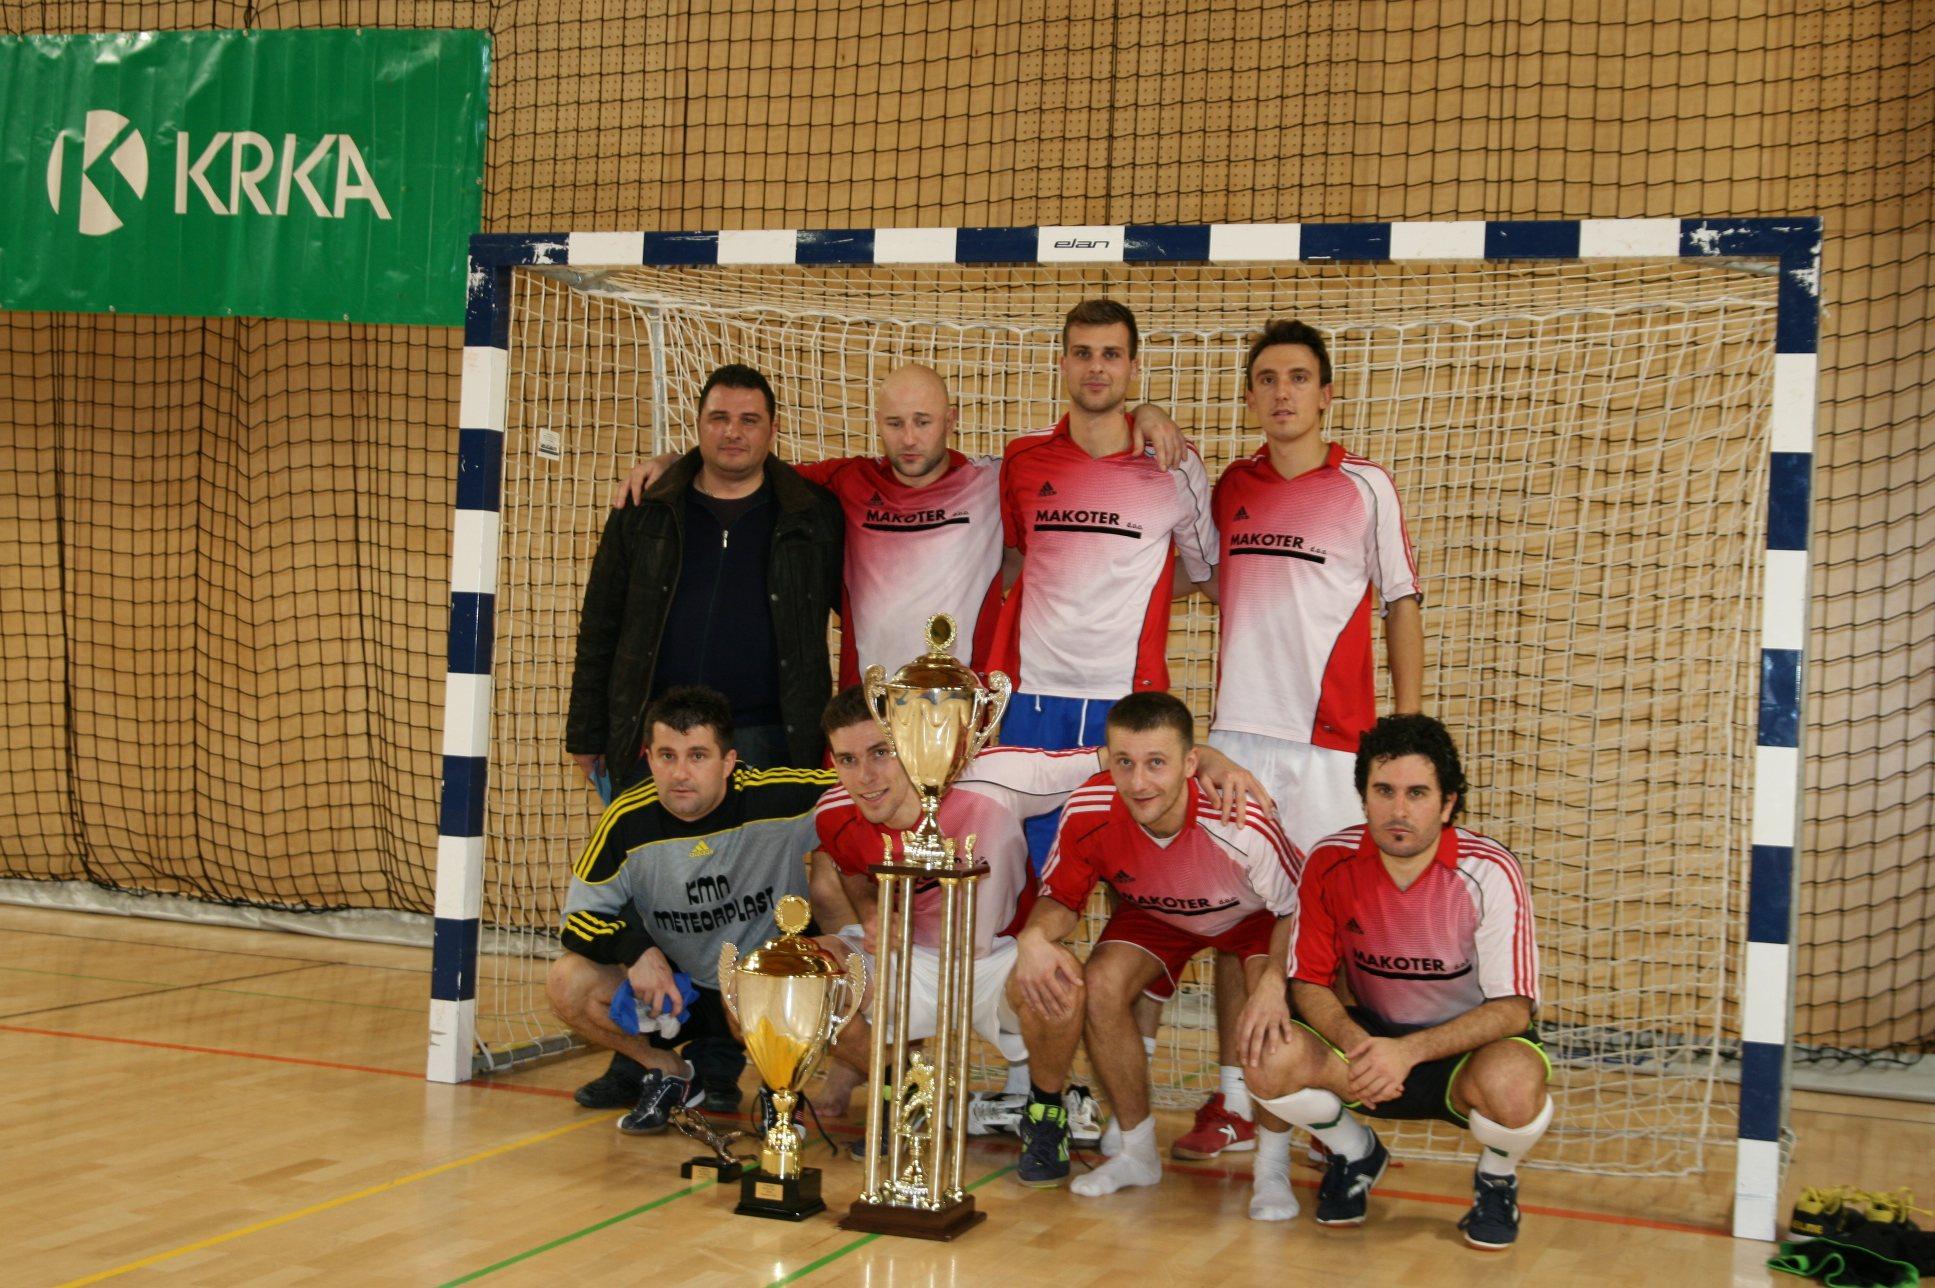 Turnir v Ljutomeru je osvojila ekipa SM Team.